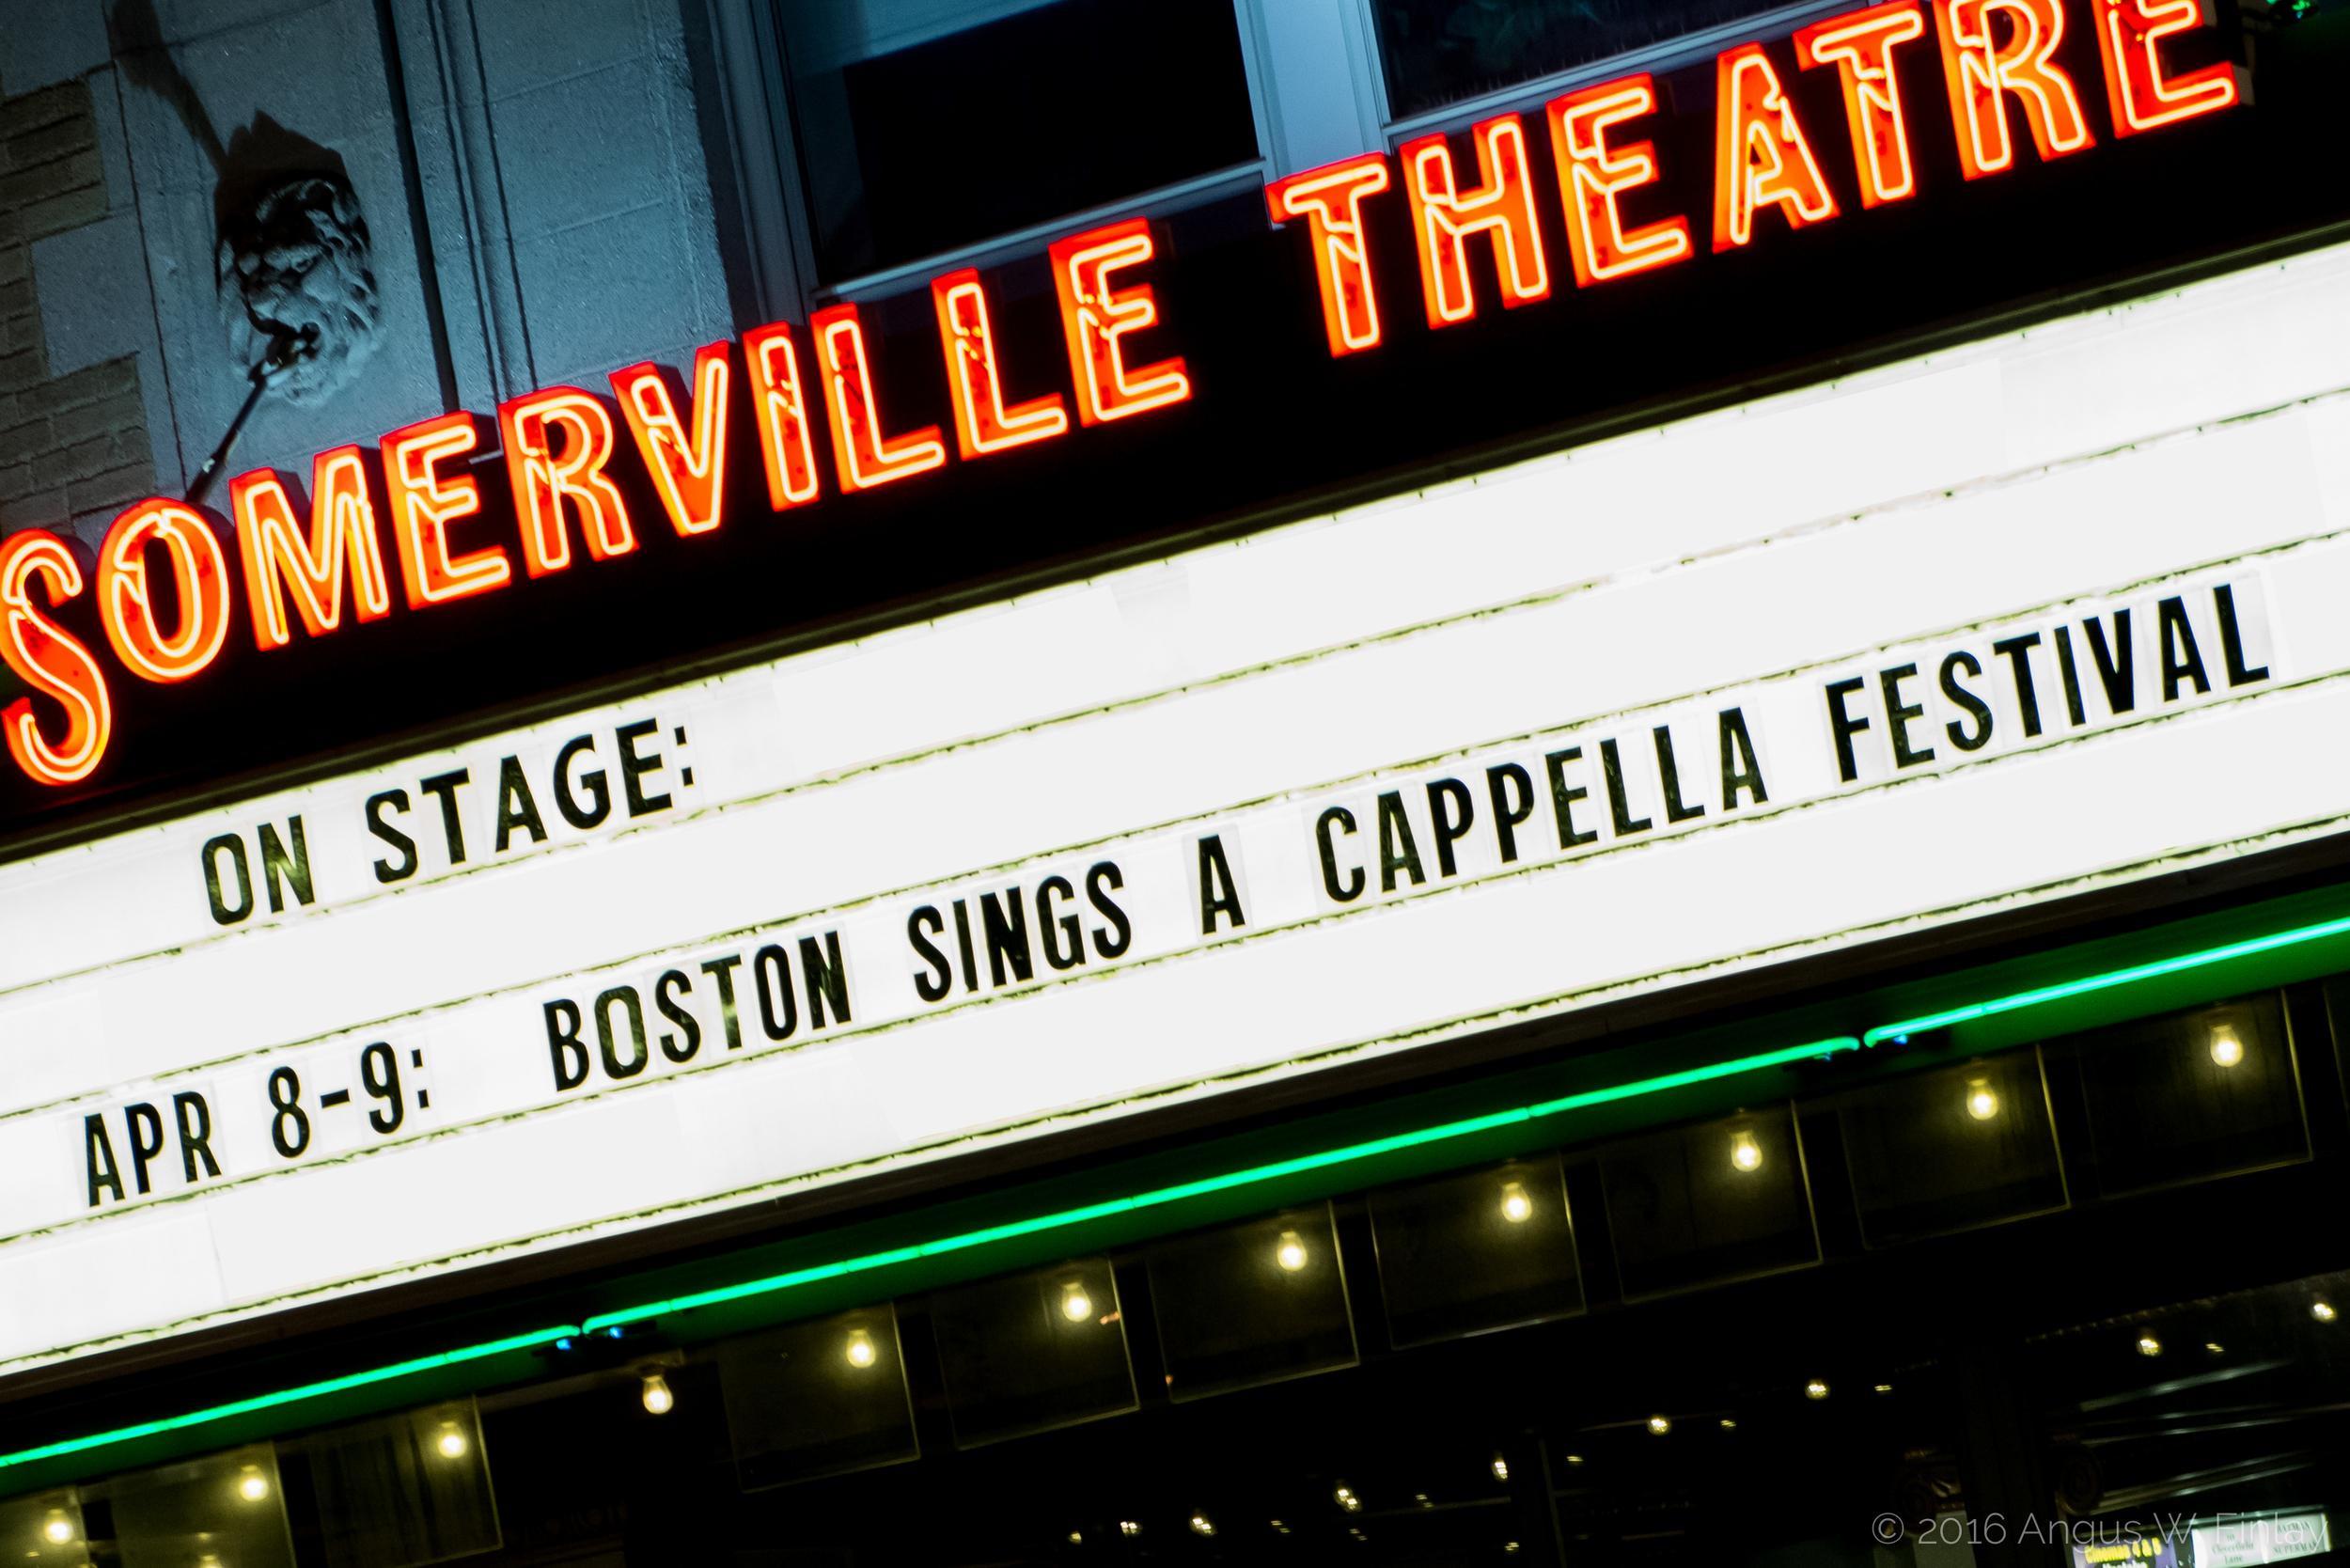 Boston Sings A Cappella Festival